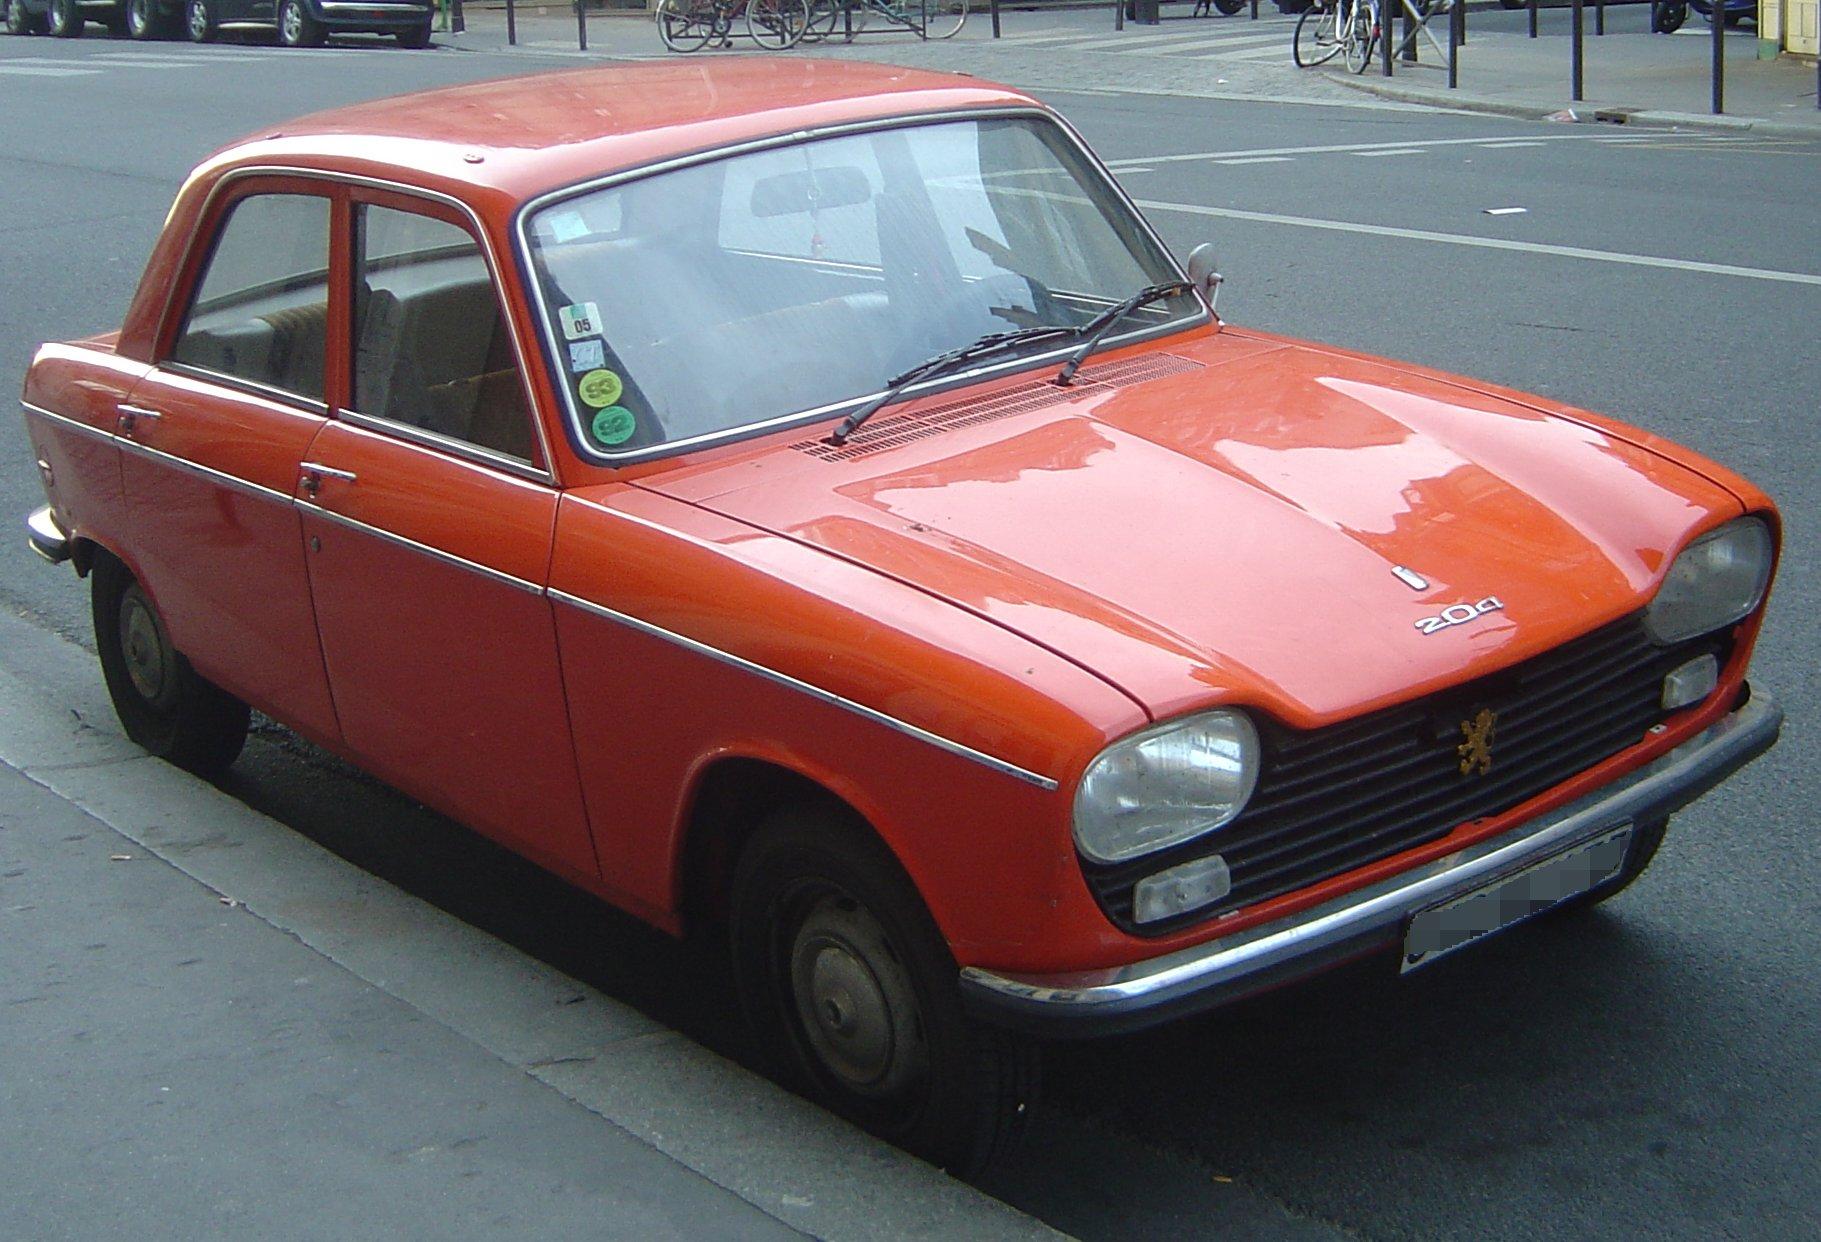 File:Peugeot 204 Dsc07972.jpg